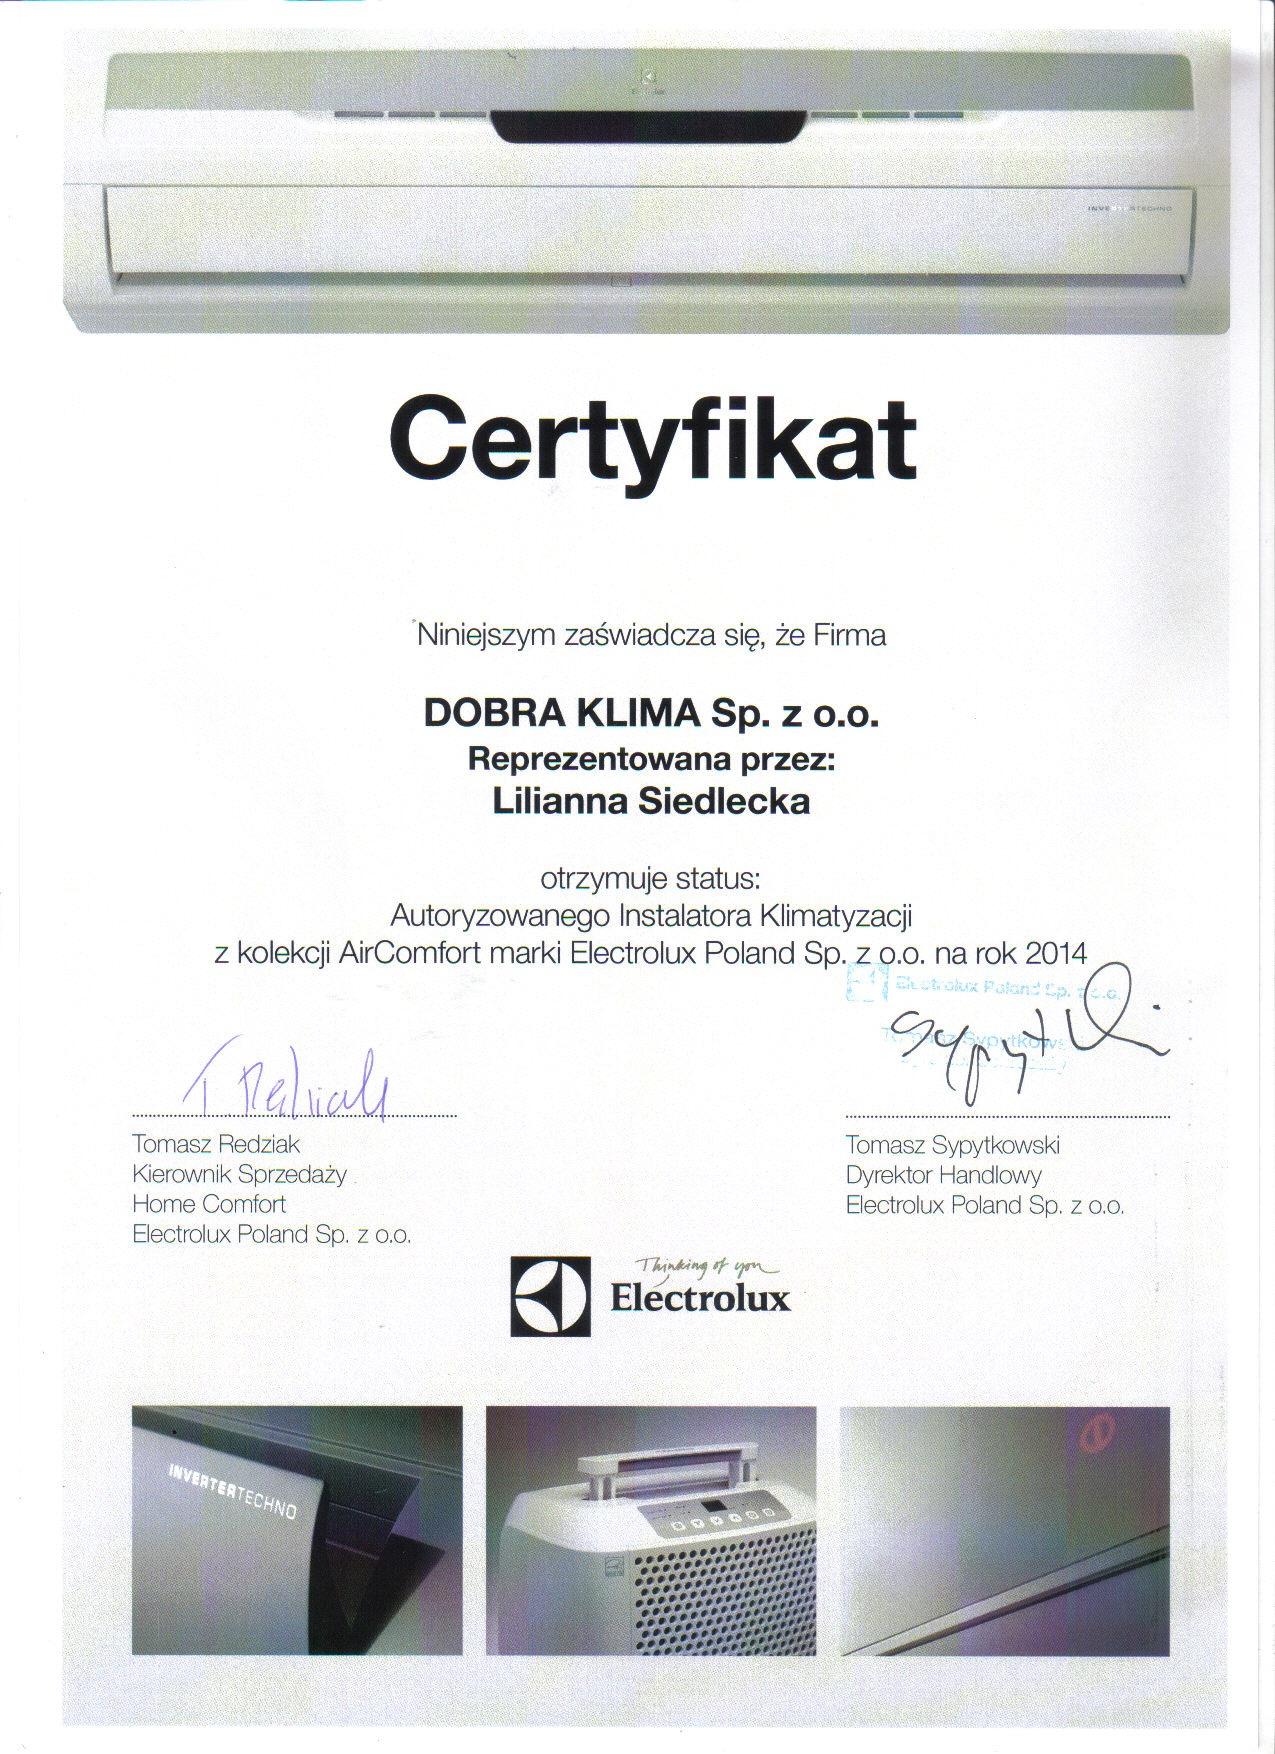 2014-certyfikat-electrolux